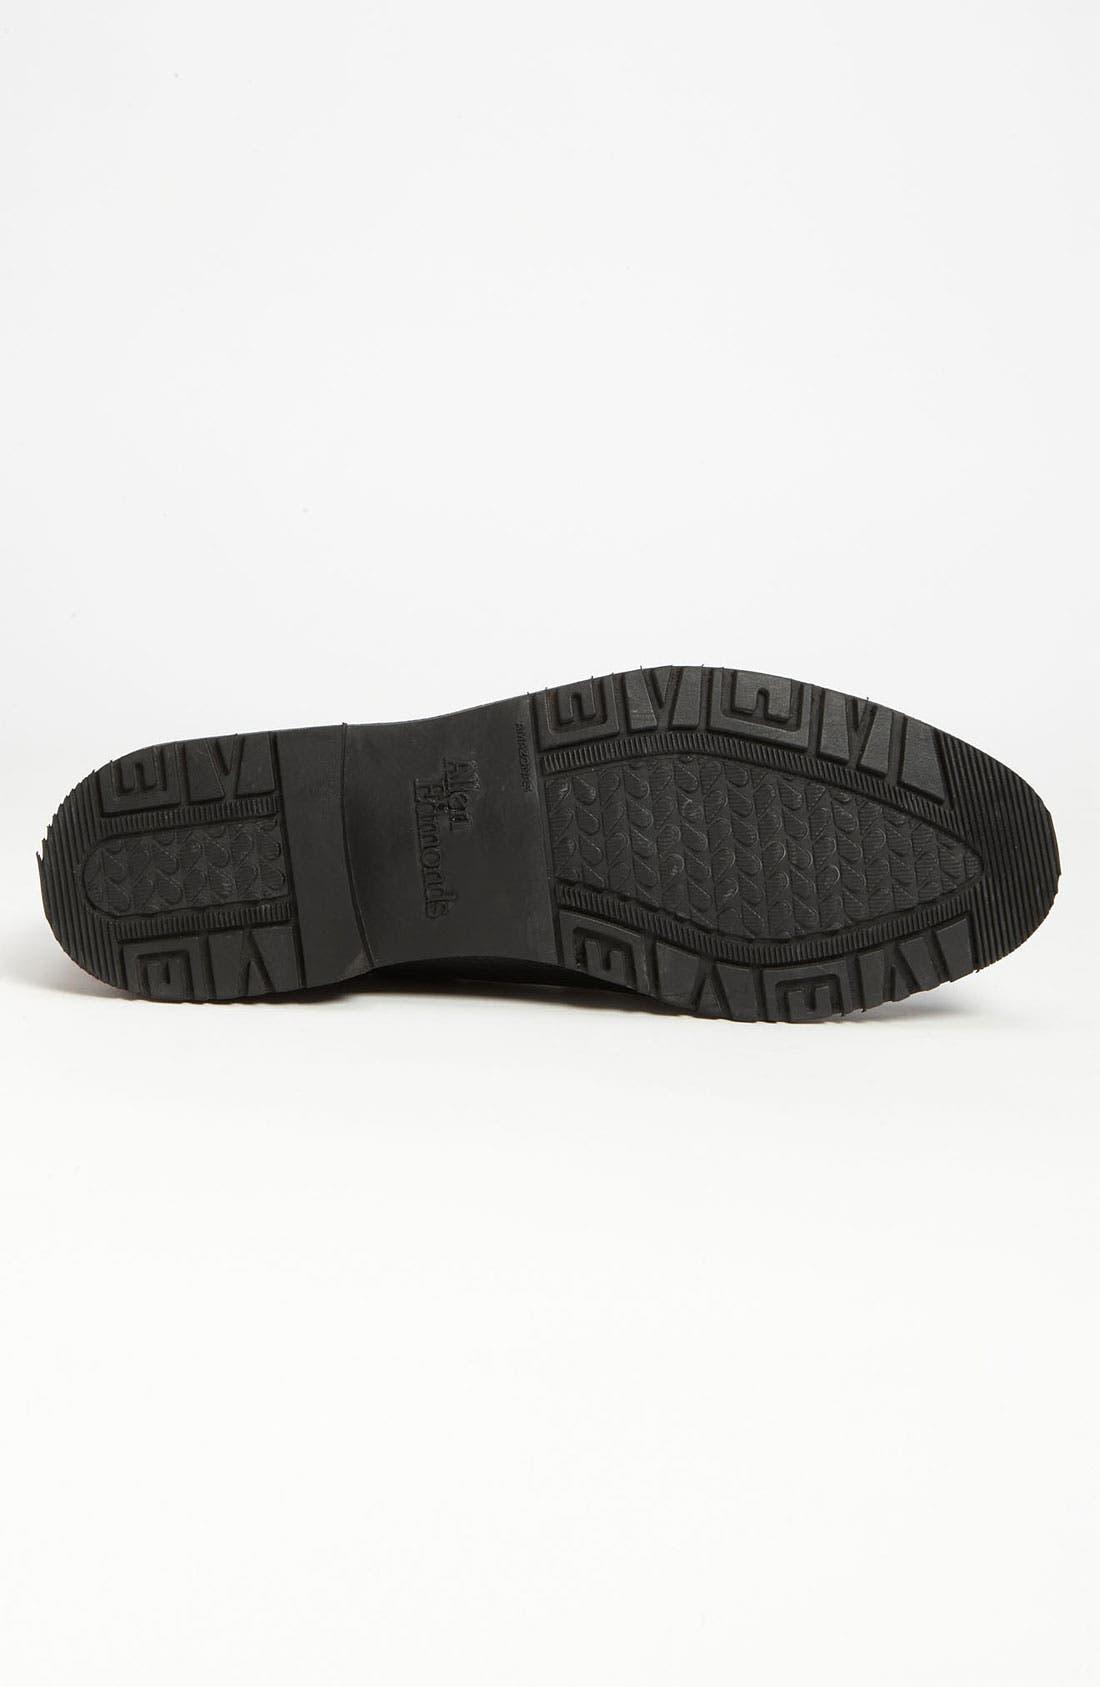 'Nashua' Tassel Loafer,                             Alternate thumbnail 4, color,                             Black/ Brown